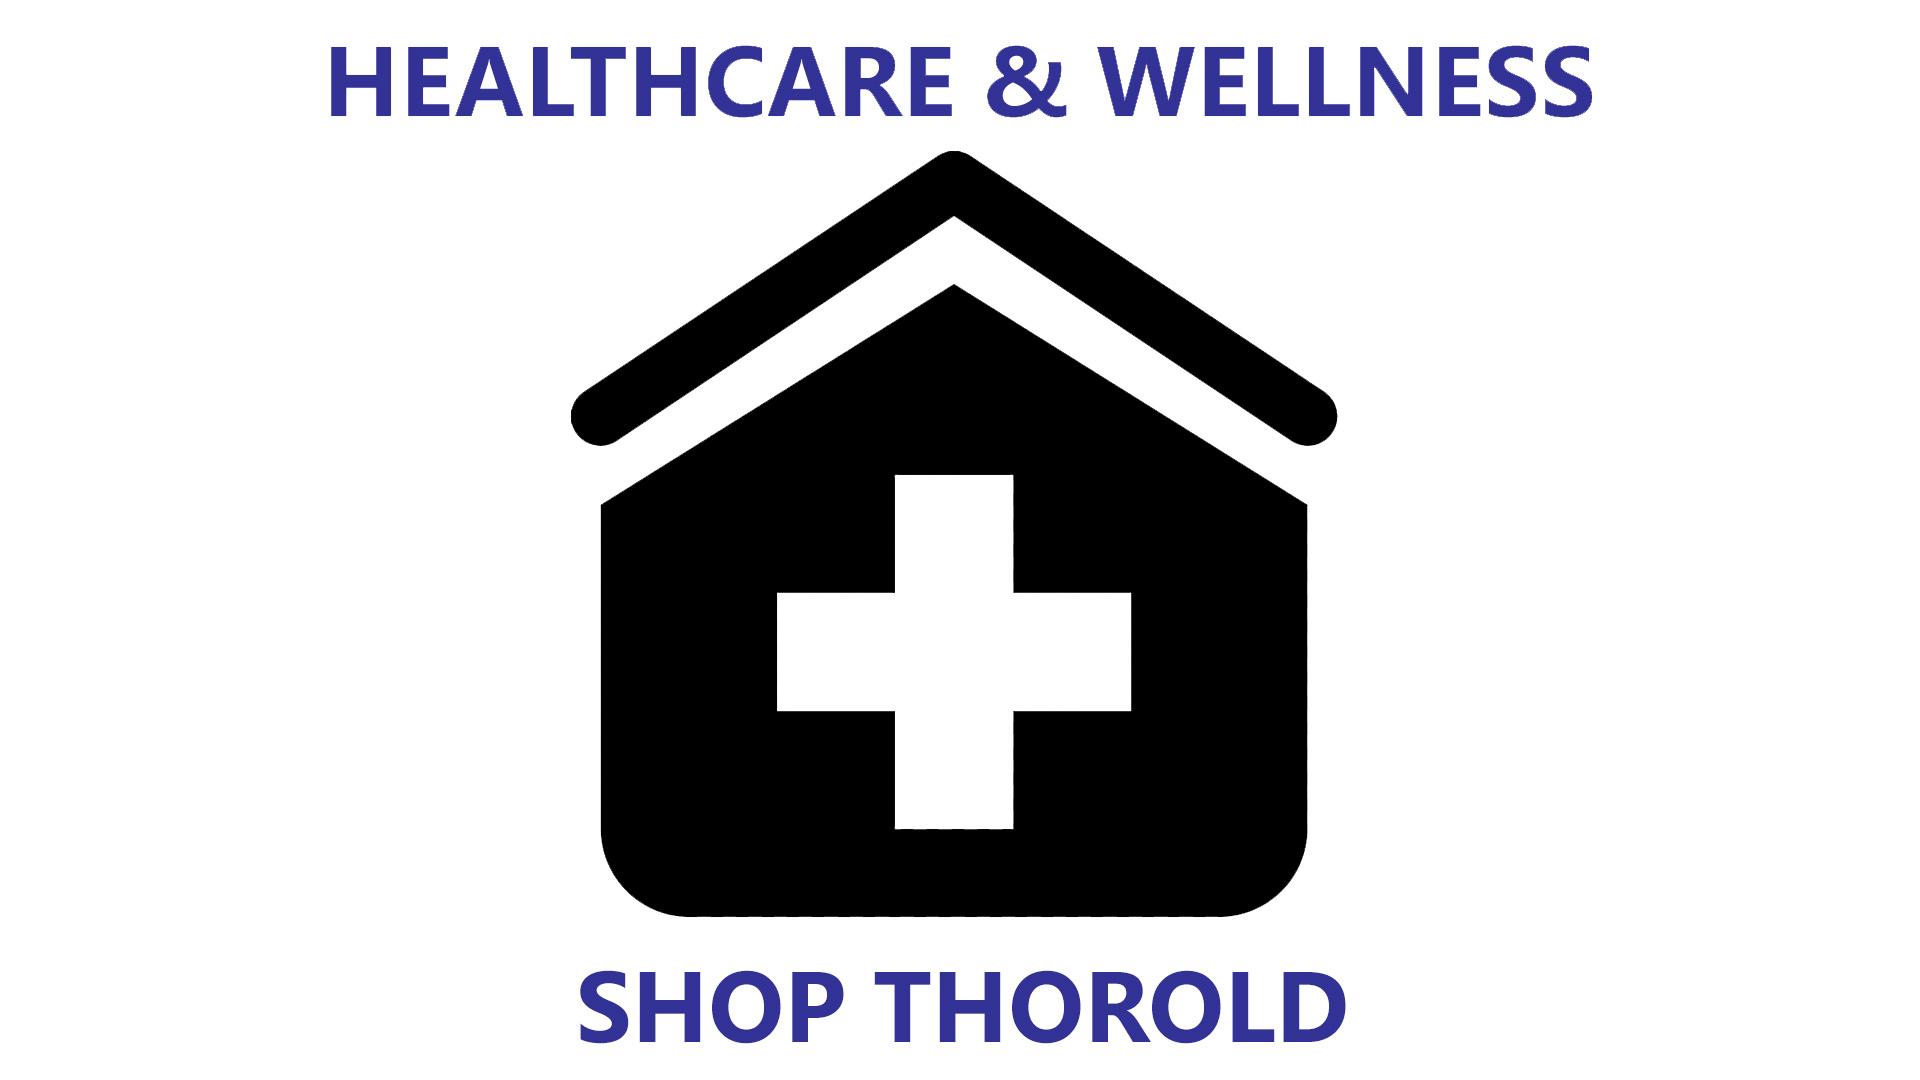 healthcarewellness_shopthorold